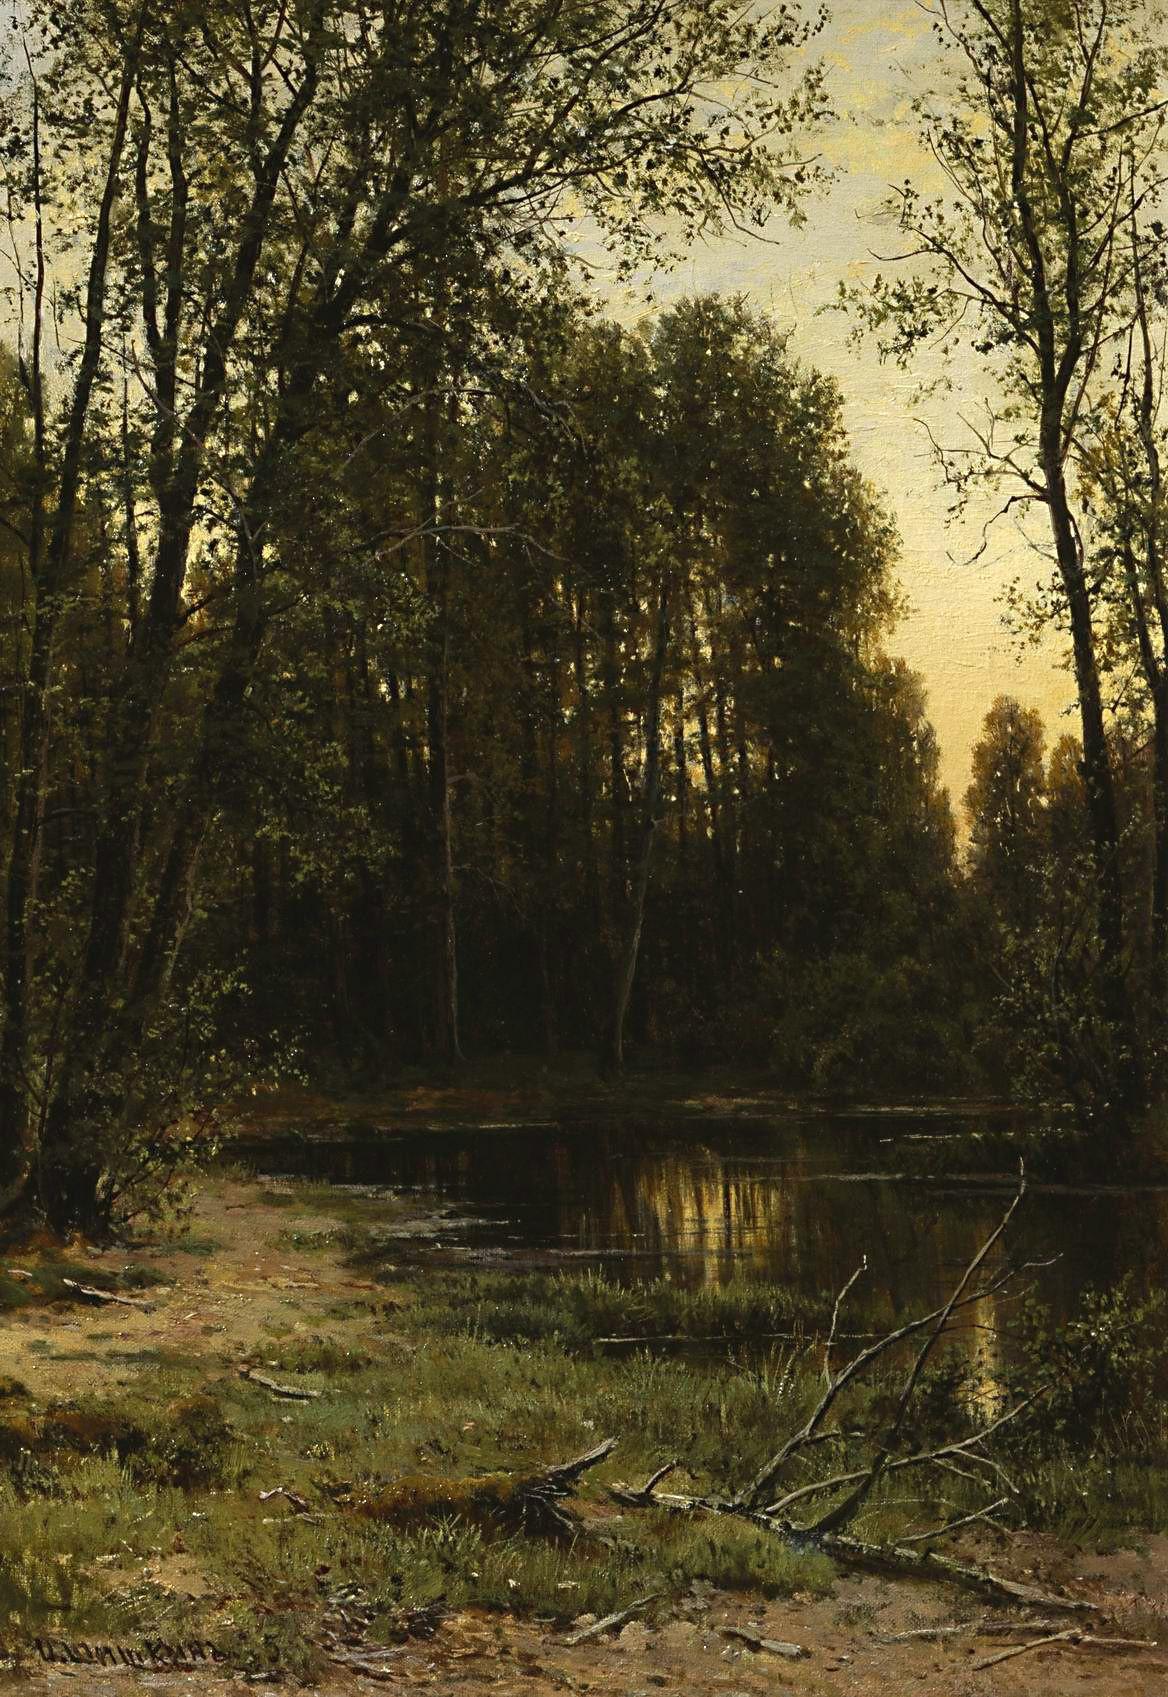 Ivan Shishkin. River Creek in the woods